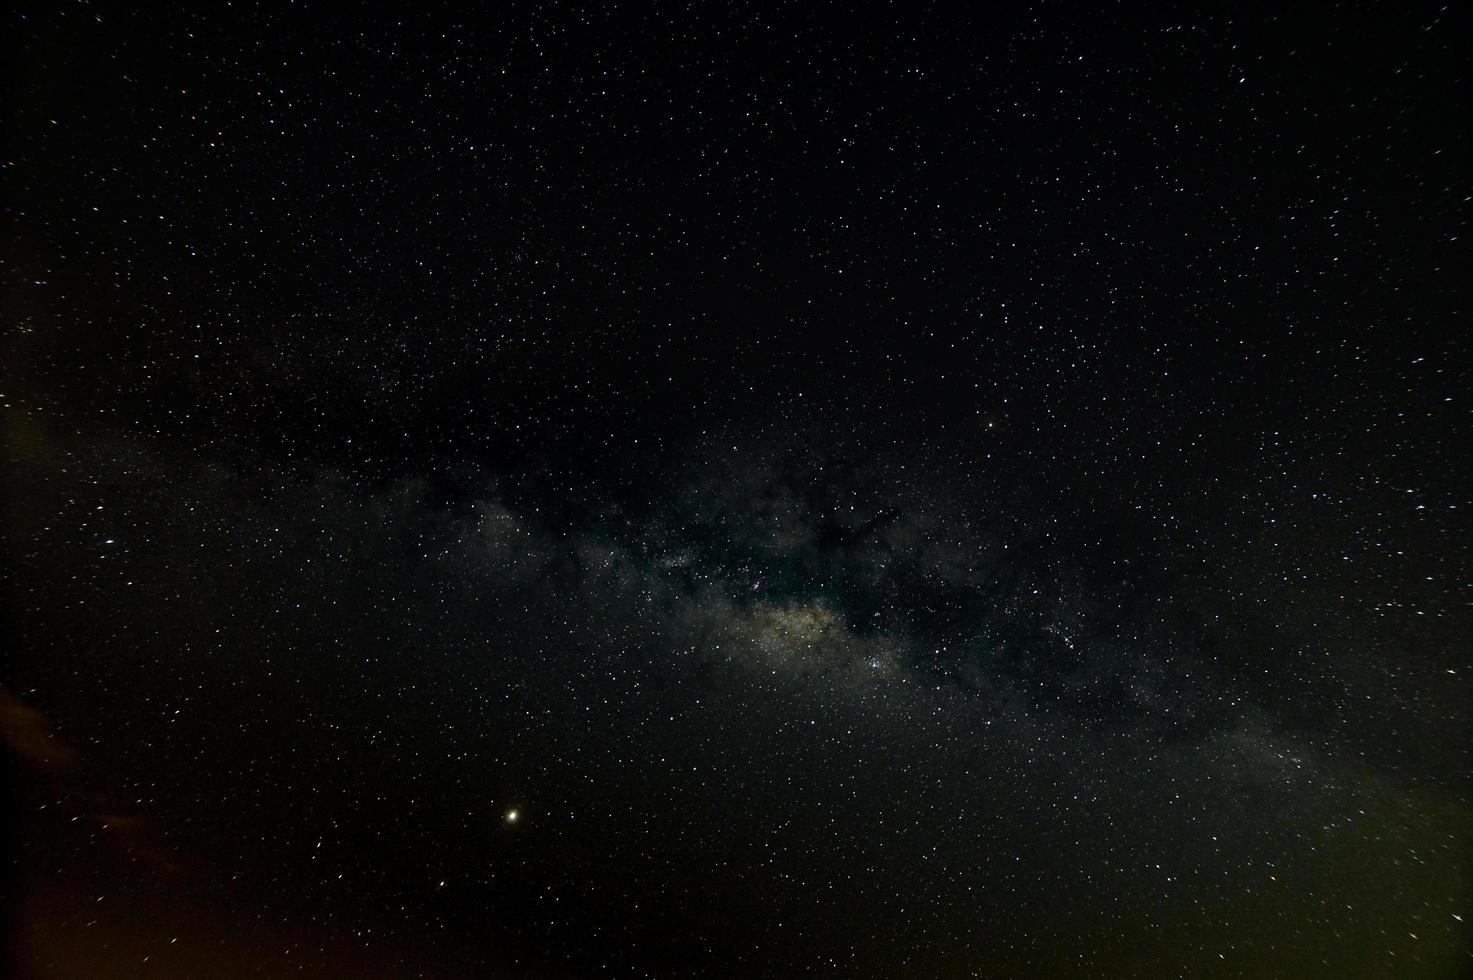 via lattea nel cielo notturno profondo foto